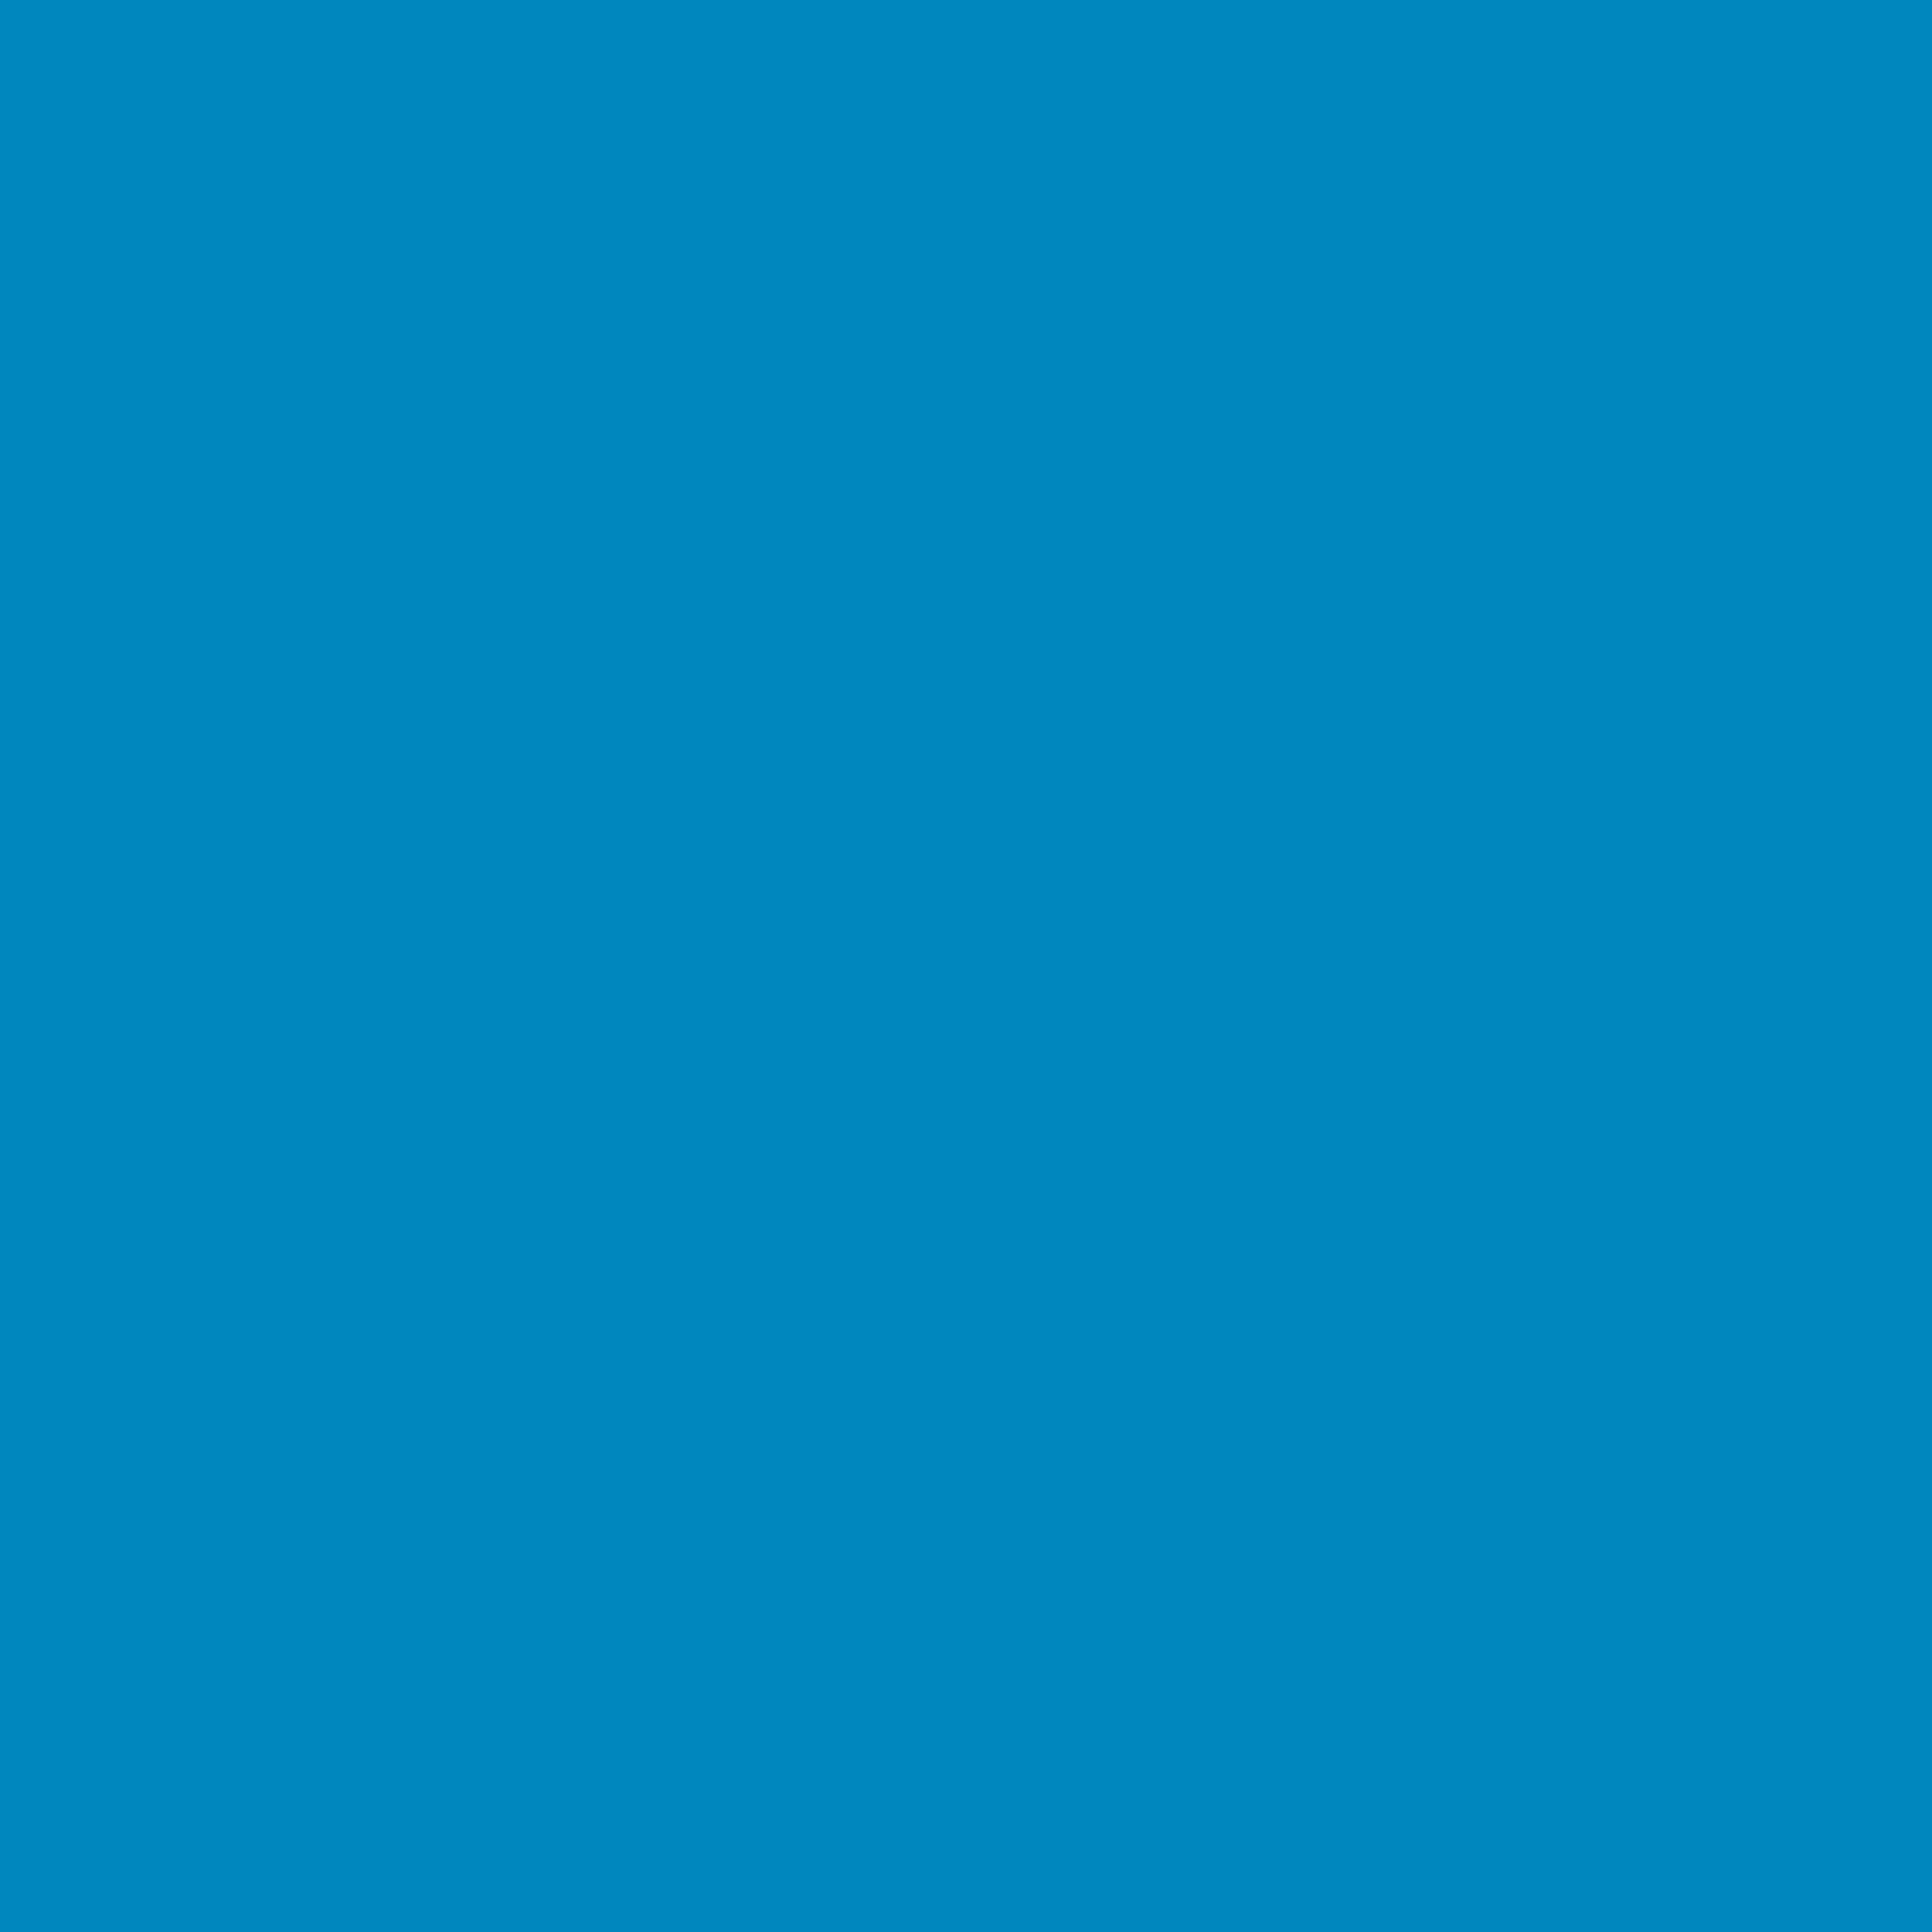 2048x2048 Blue NCS Solid Color Background